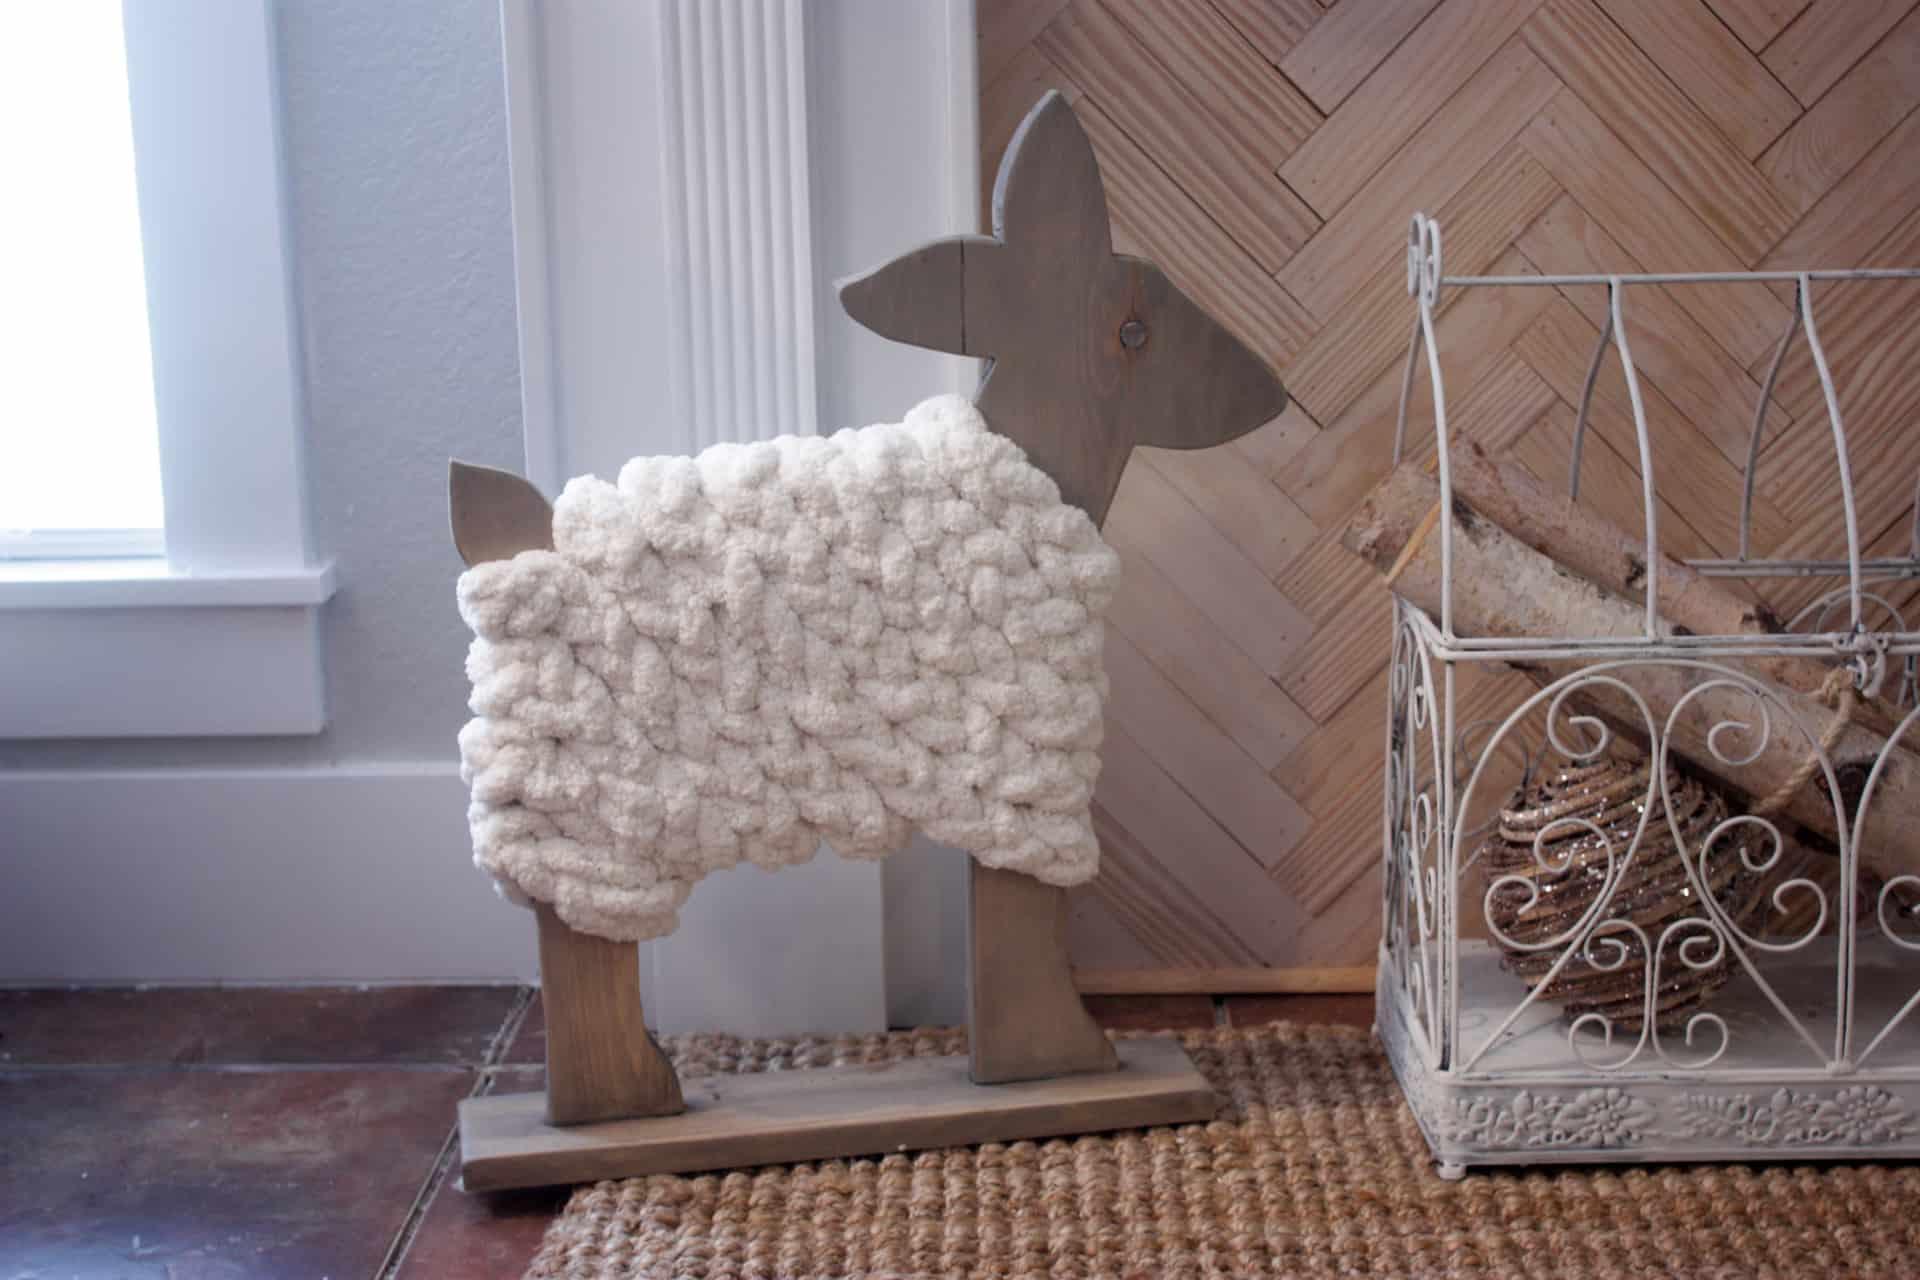 Wooden Deer Decor - Deer made of scrap wood and wrapped in big yarn